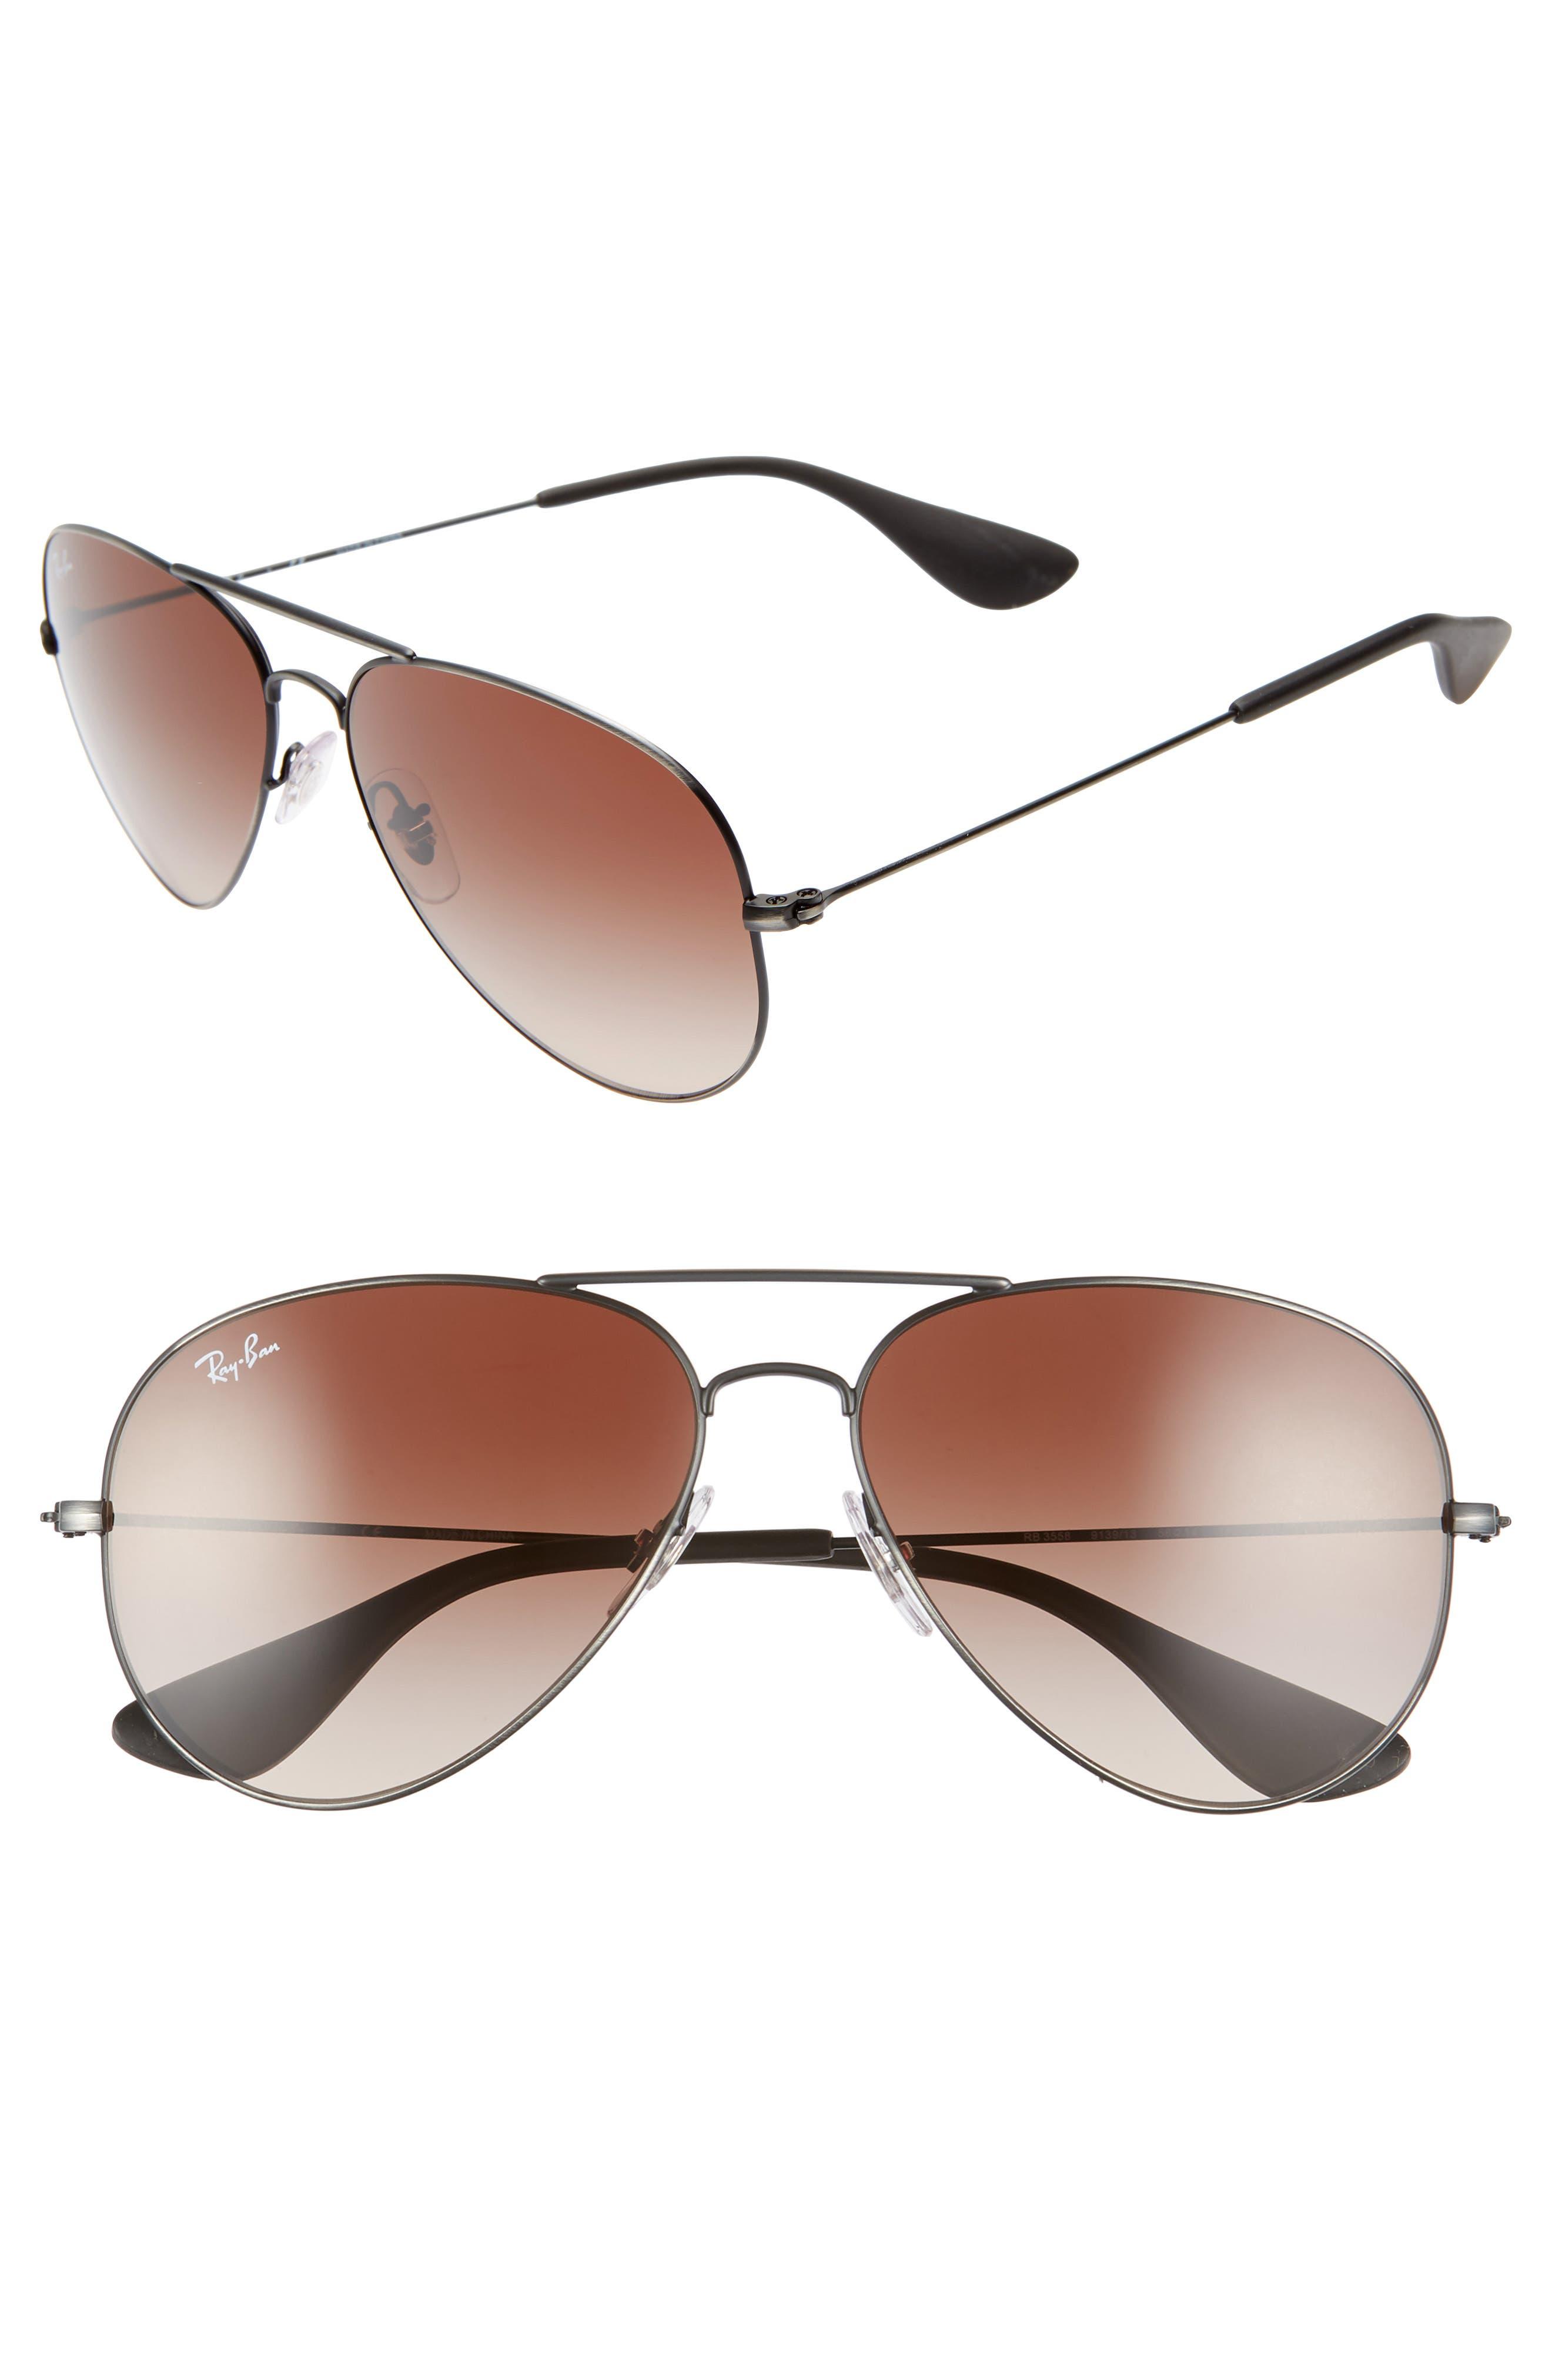 Ray-Ban Pilot 5m Gradient Sunglasses - Matte Black